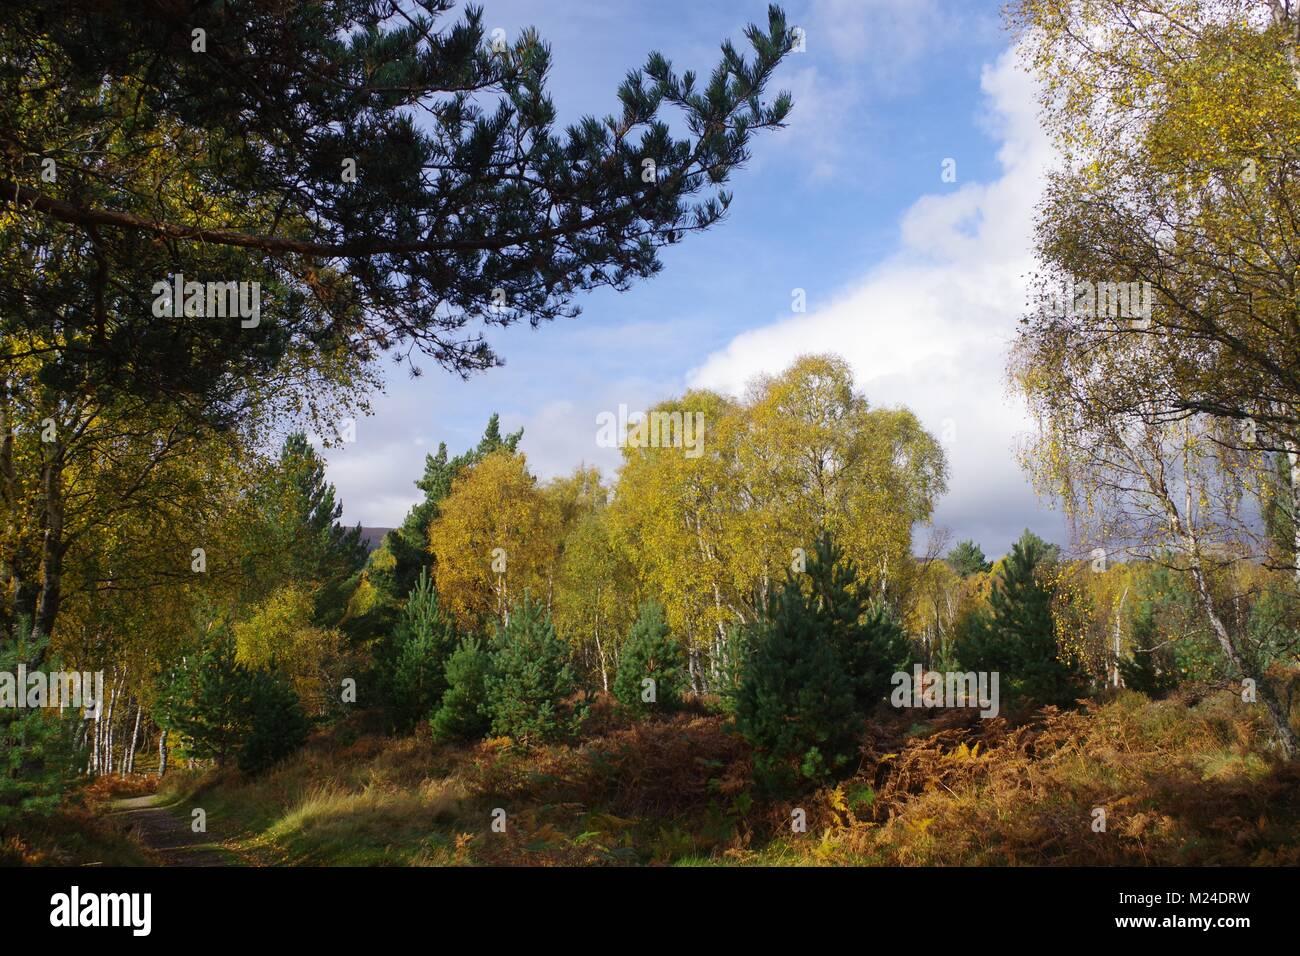 Golden Autumn Leafs of a Mixed Birch Forest. Muir of Dinnet, Cairngorms, Scotland, UK. October, 2017. - Stock Image